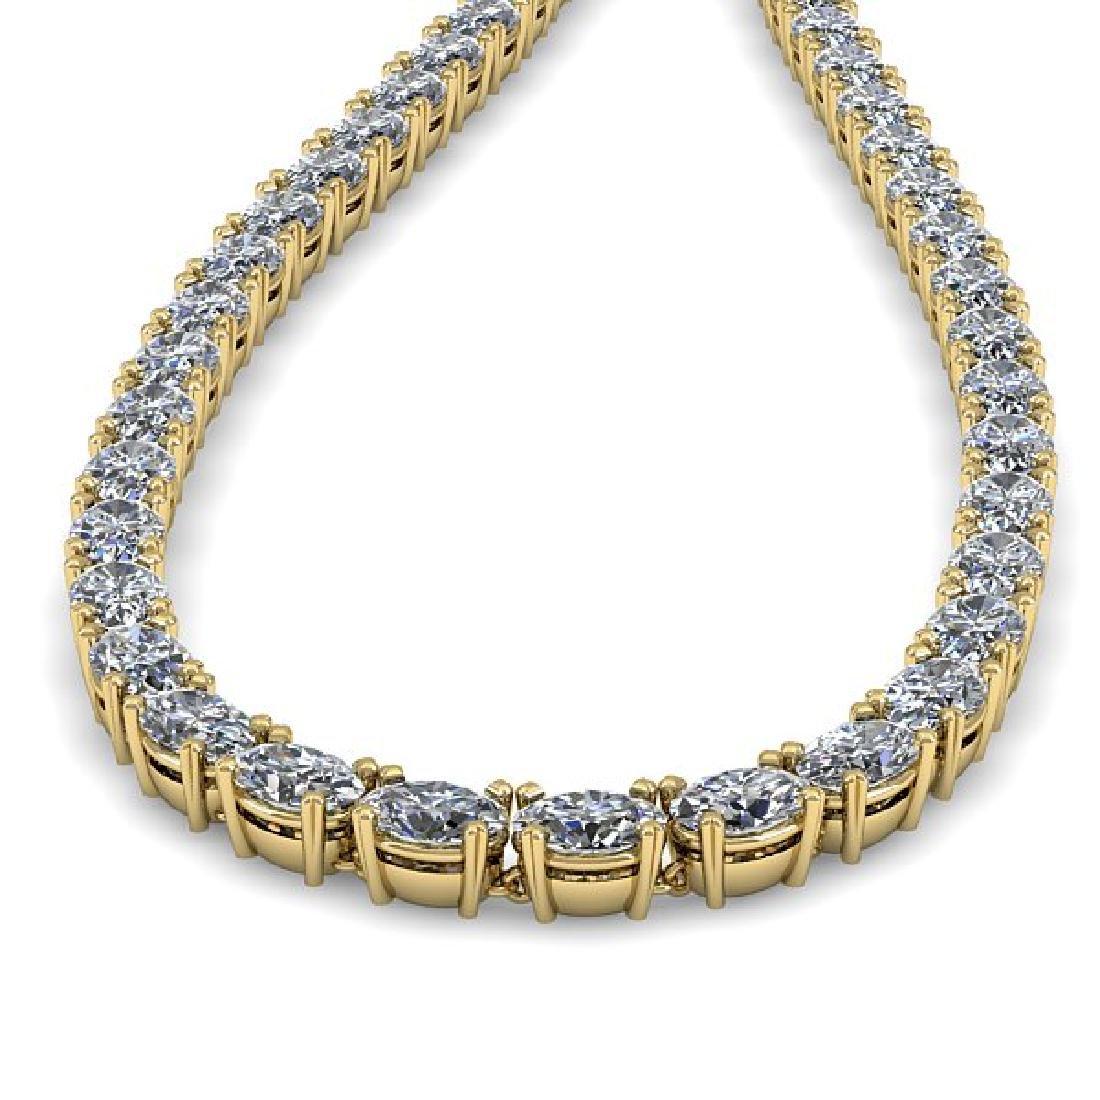 26 CTW Oval Cut Certified SI Diamond Necklace 18K - 2